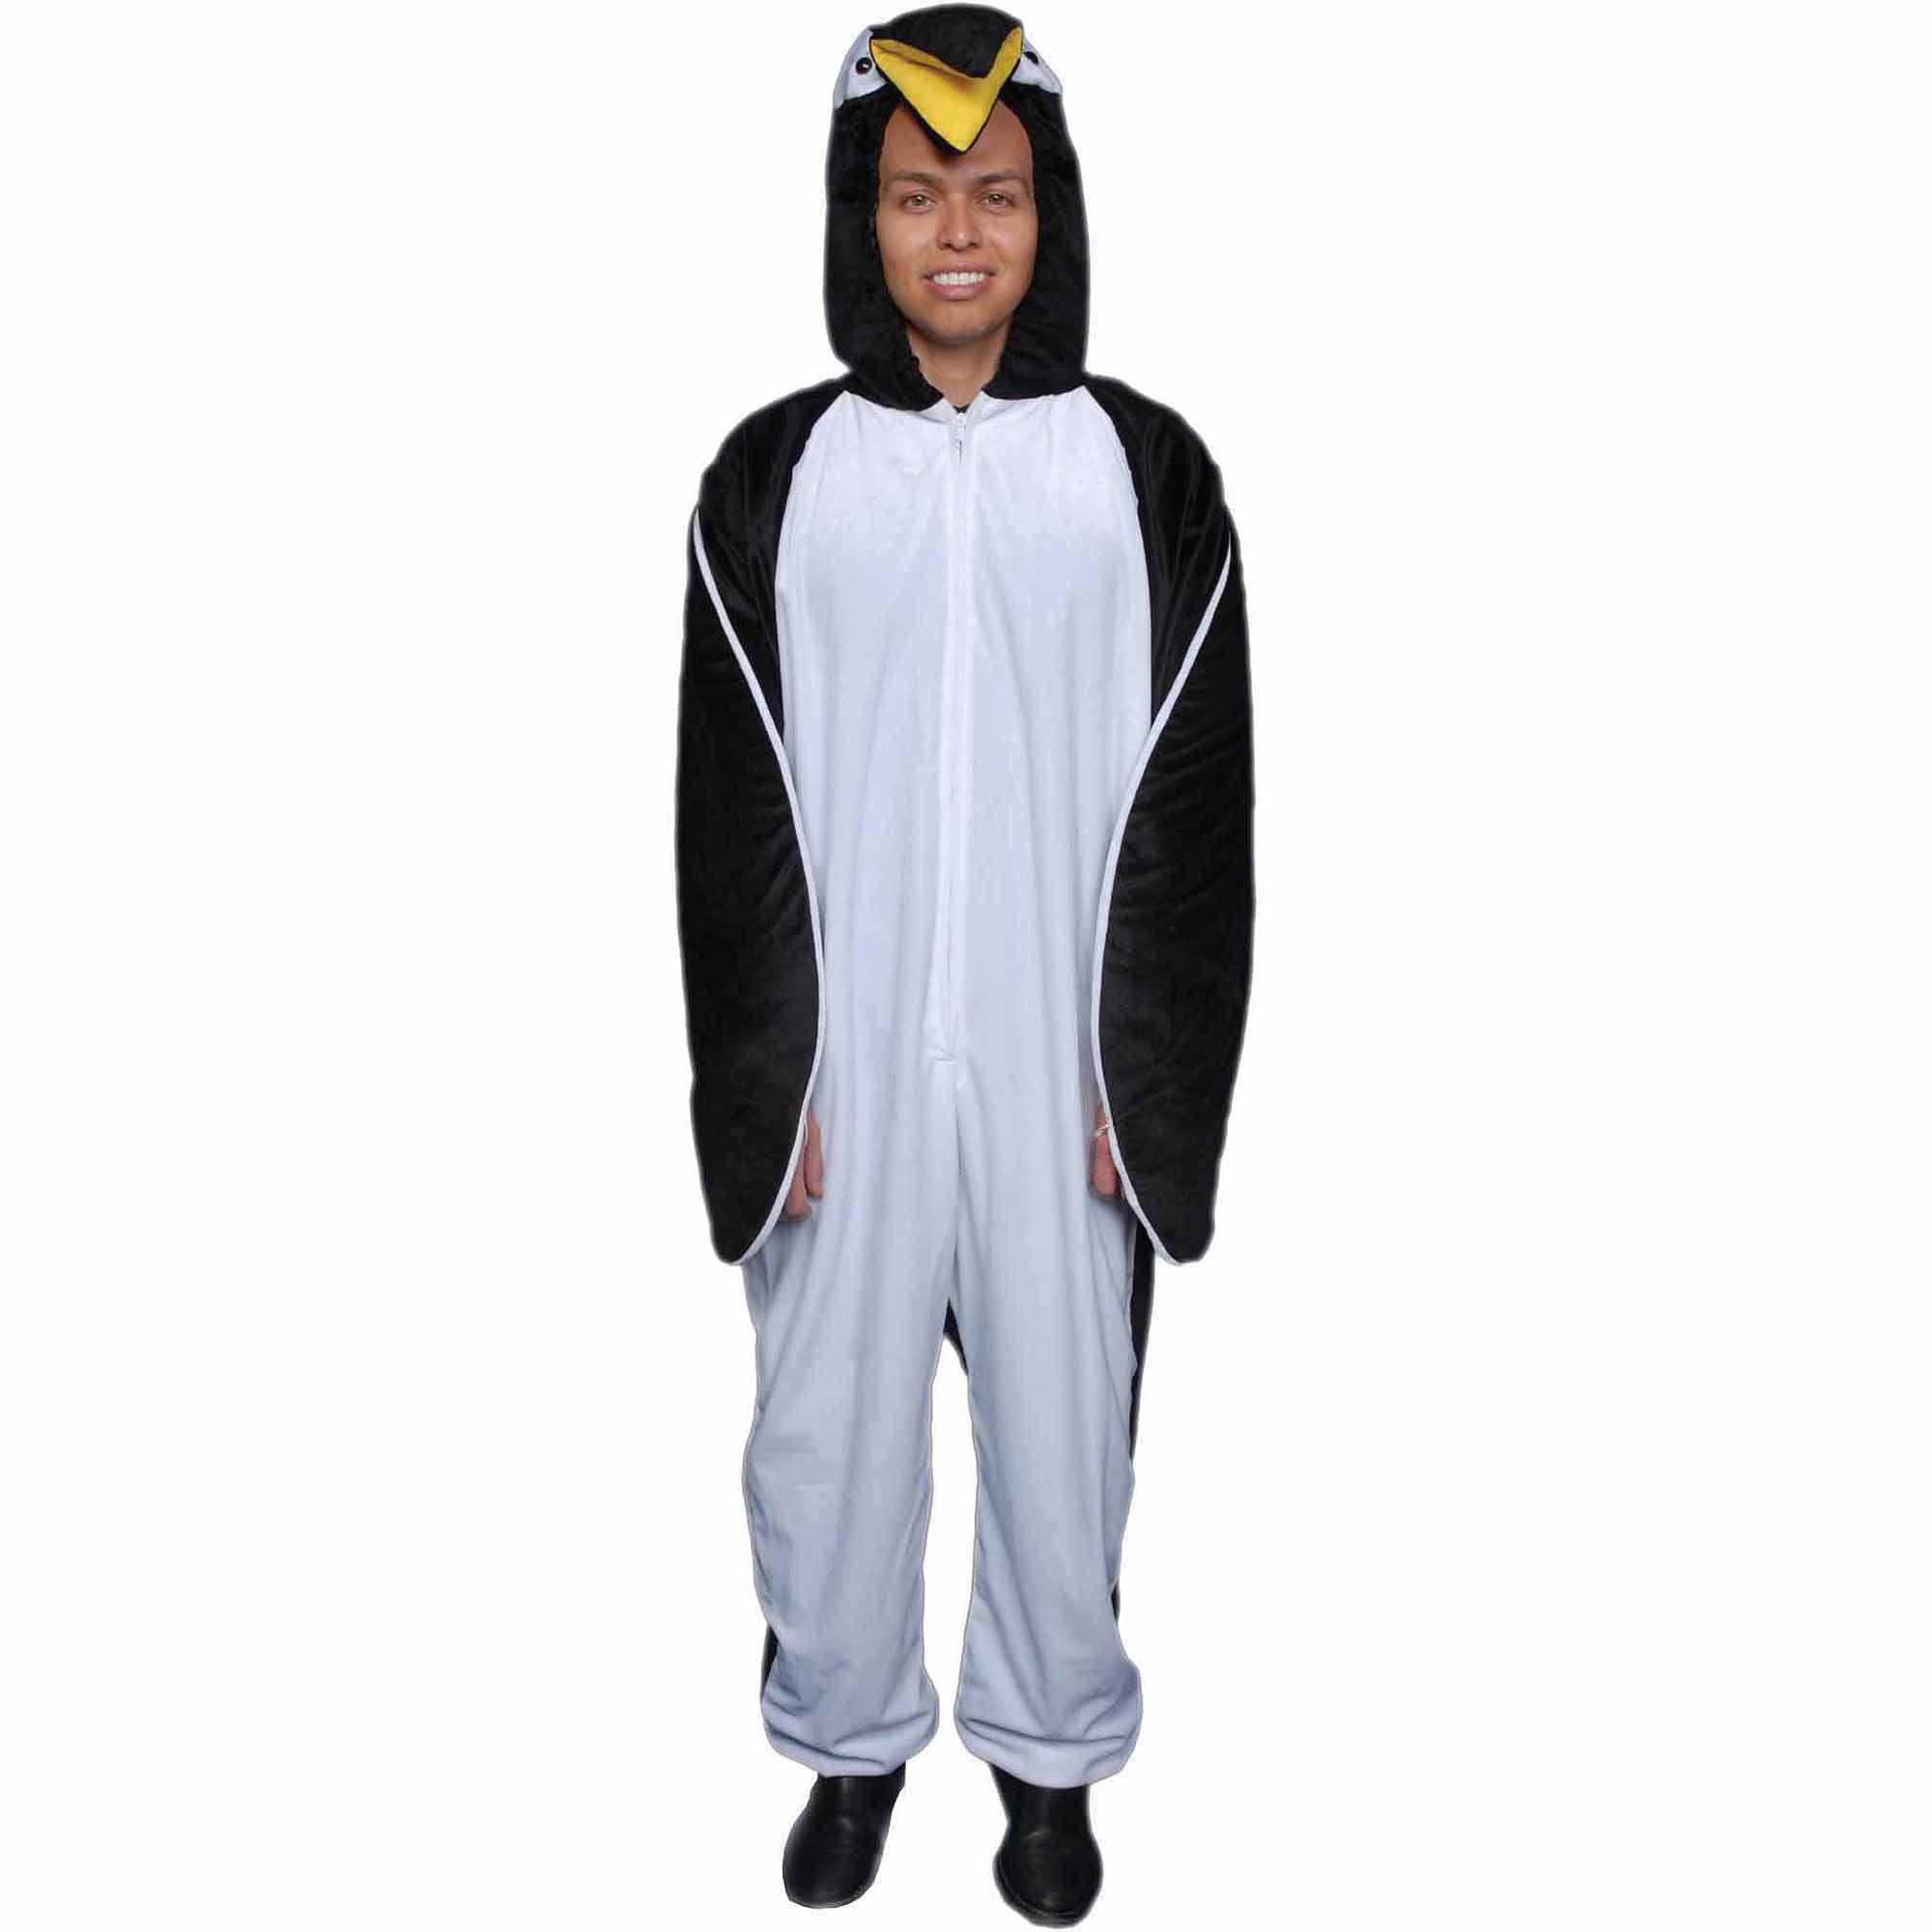 sc 1 st  Walmart & Penguin Child Halloween Costume - Walmart.com